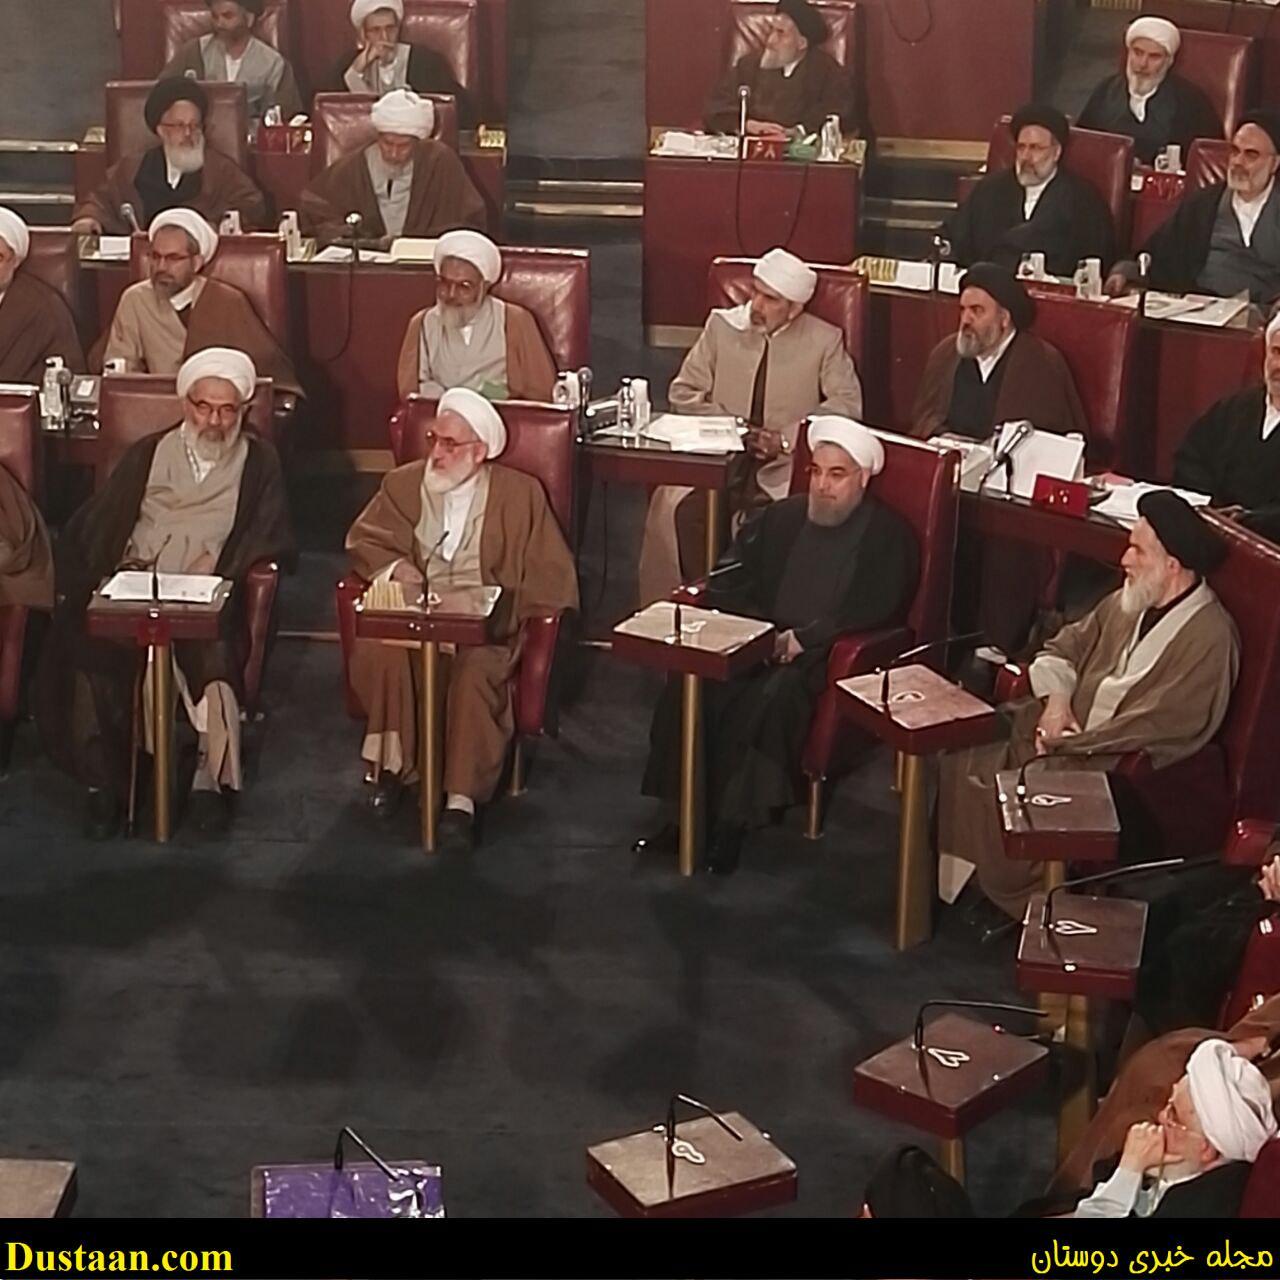 www.dustaan.com-dustaan.com-حضور روحانی در اجلاسیه خبرگان/عکس